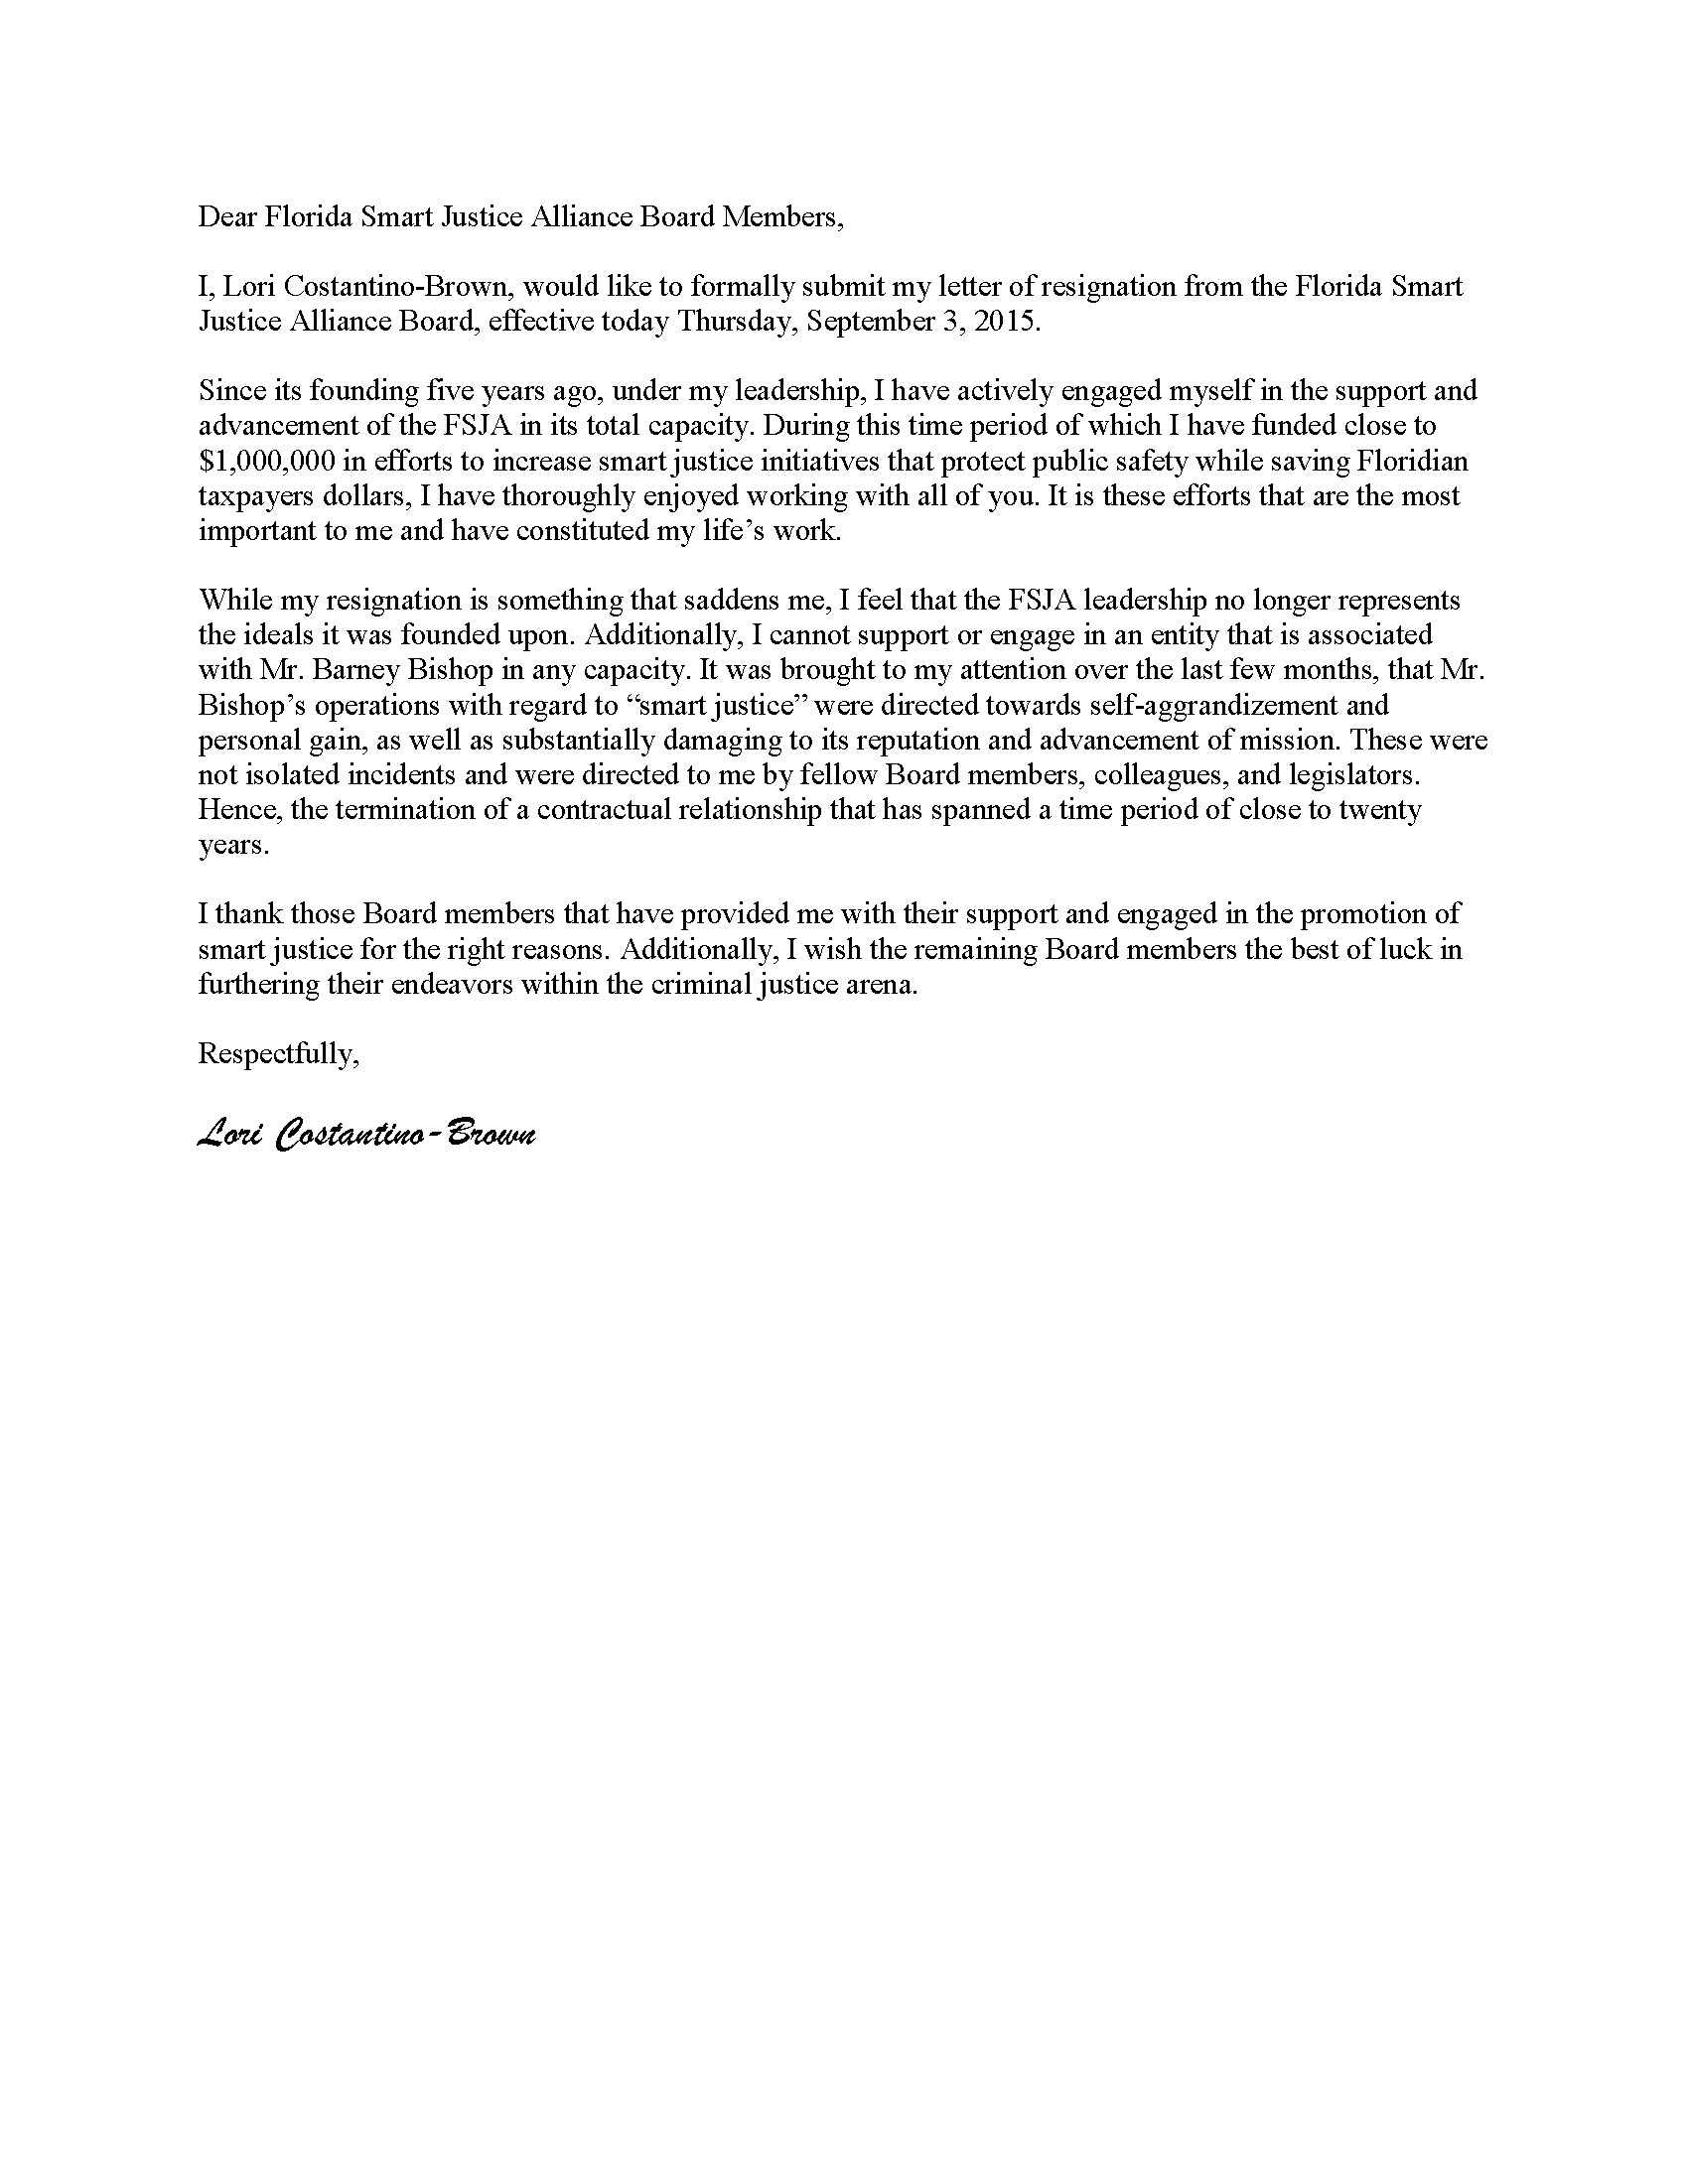 LCB Resignation letter from FSJA